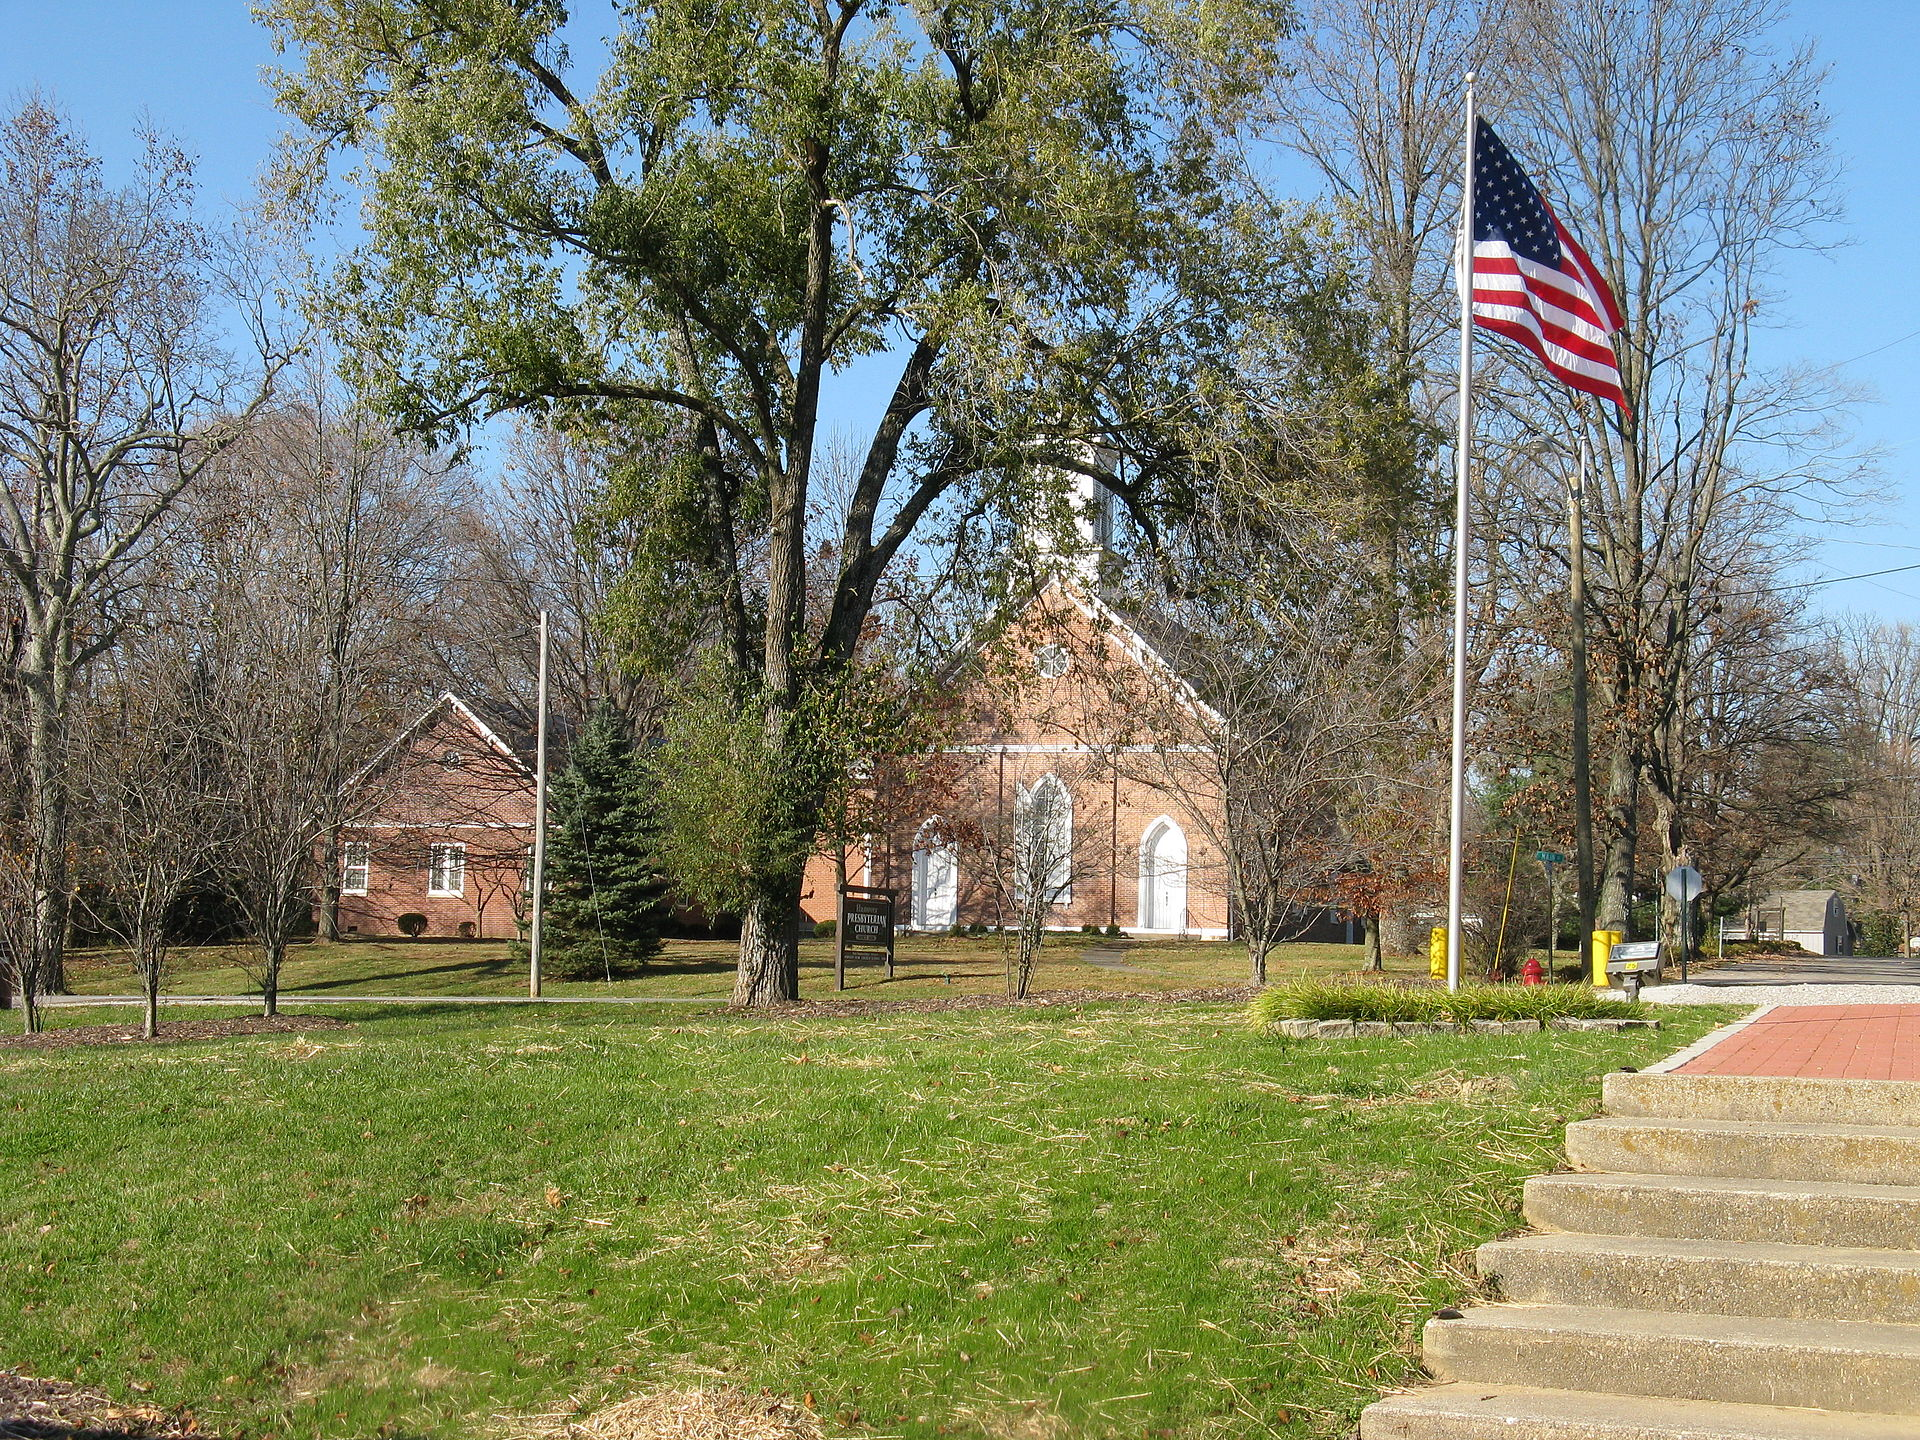 Hanover indiana wikipedia for The hanover house